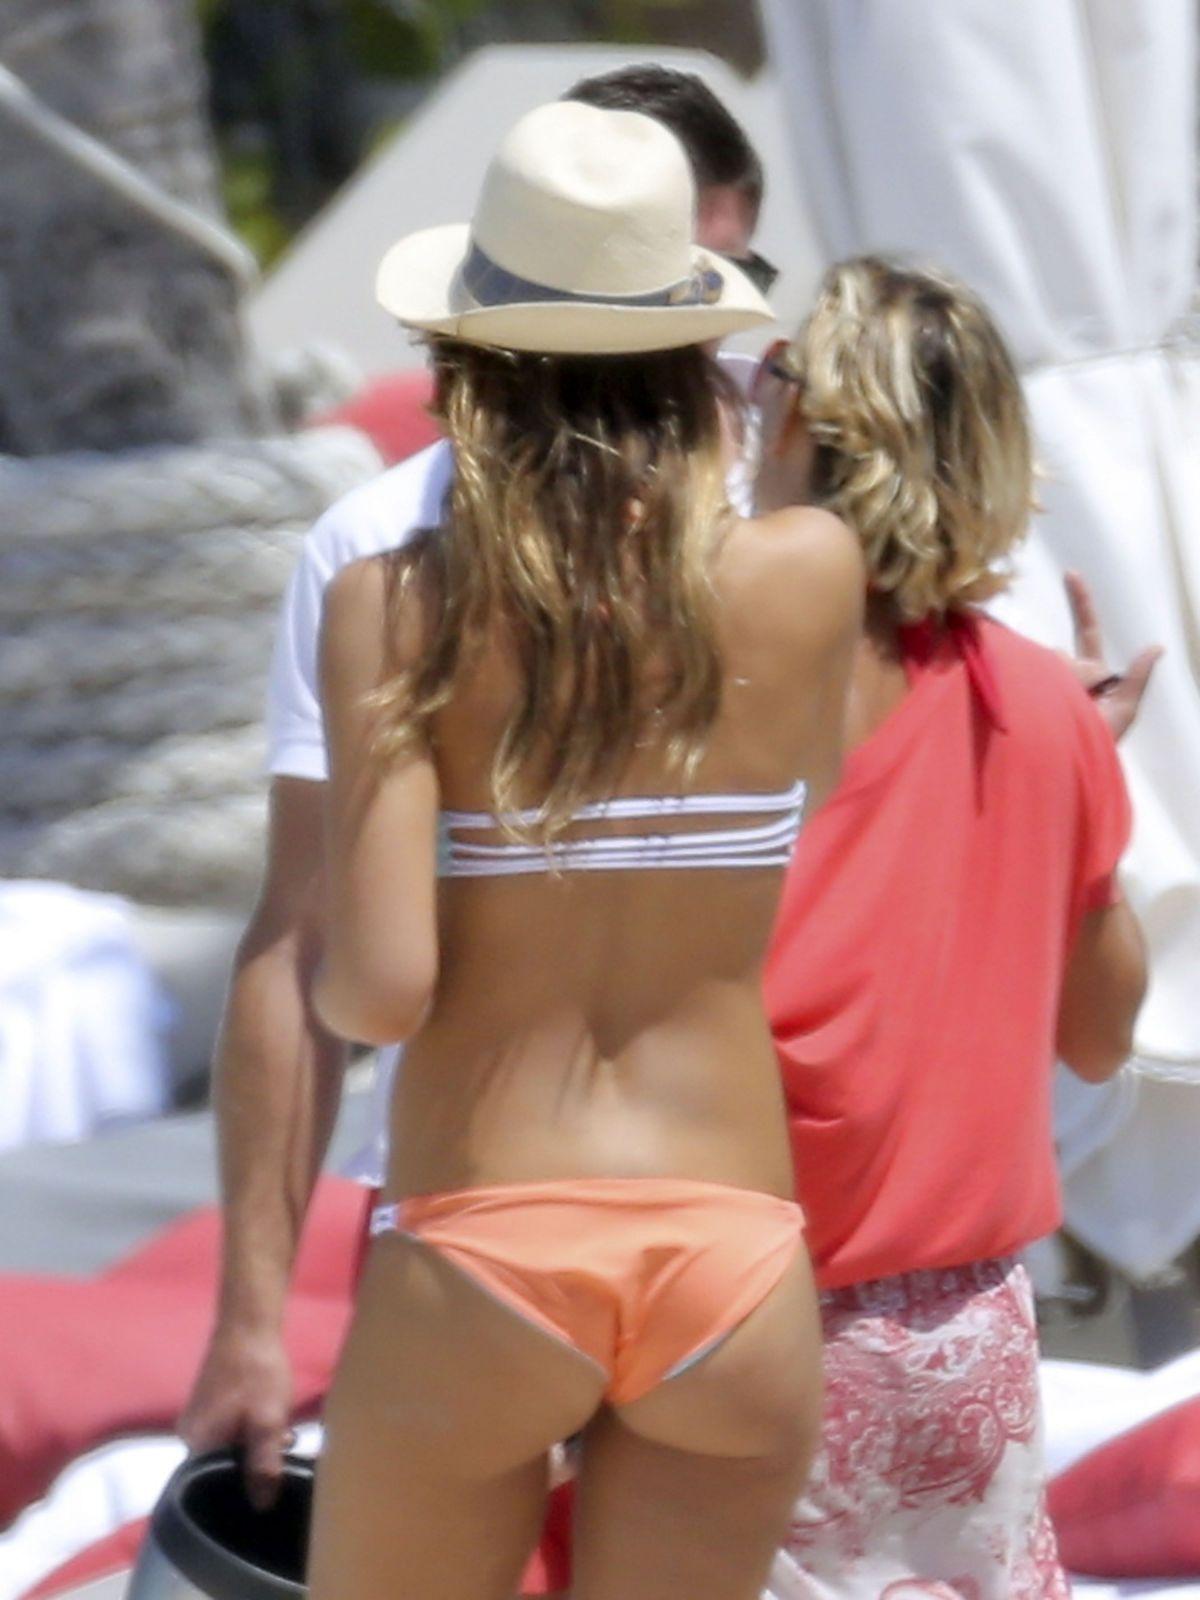 Alicia silverstone celebrity leaked nudes